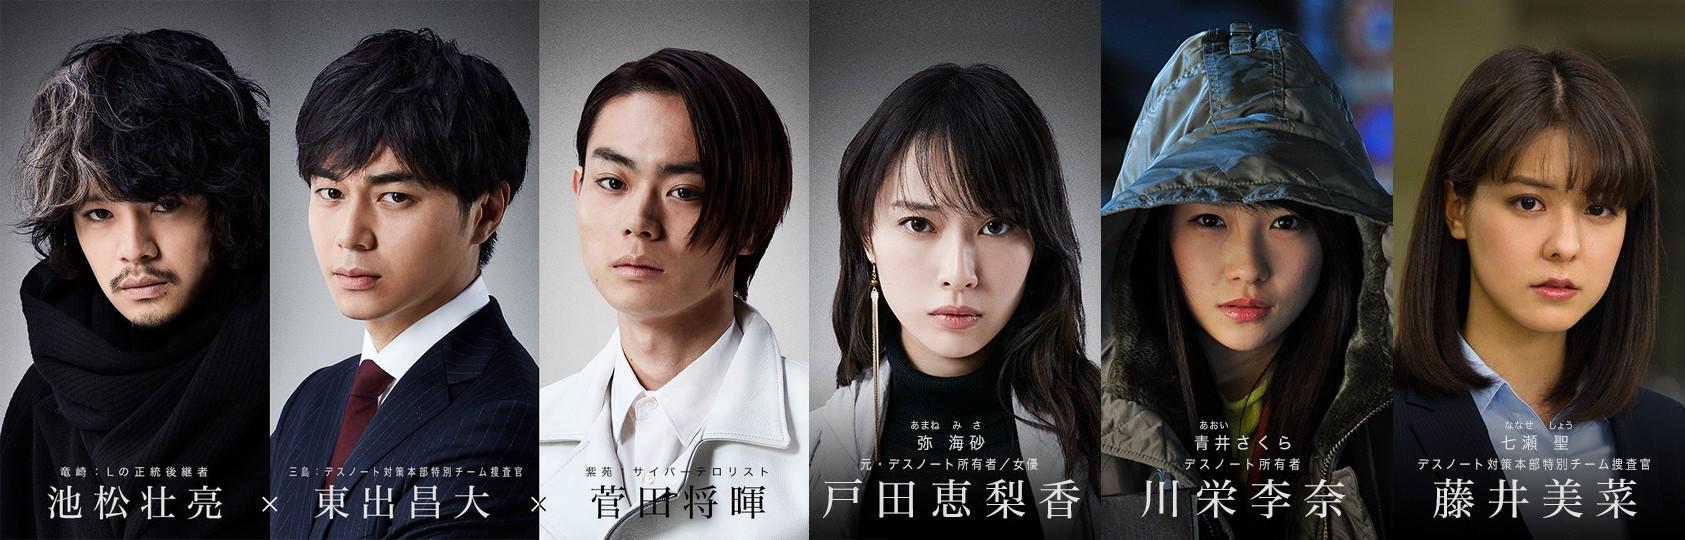 Perso Death Note 2016